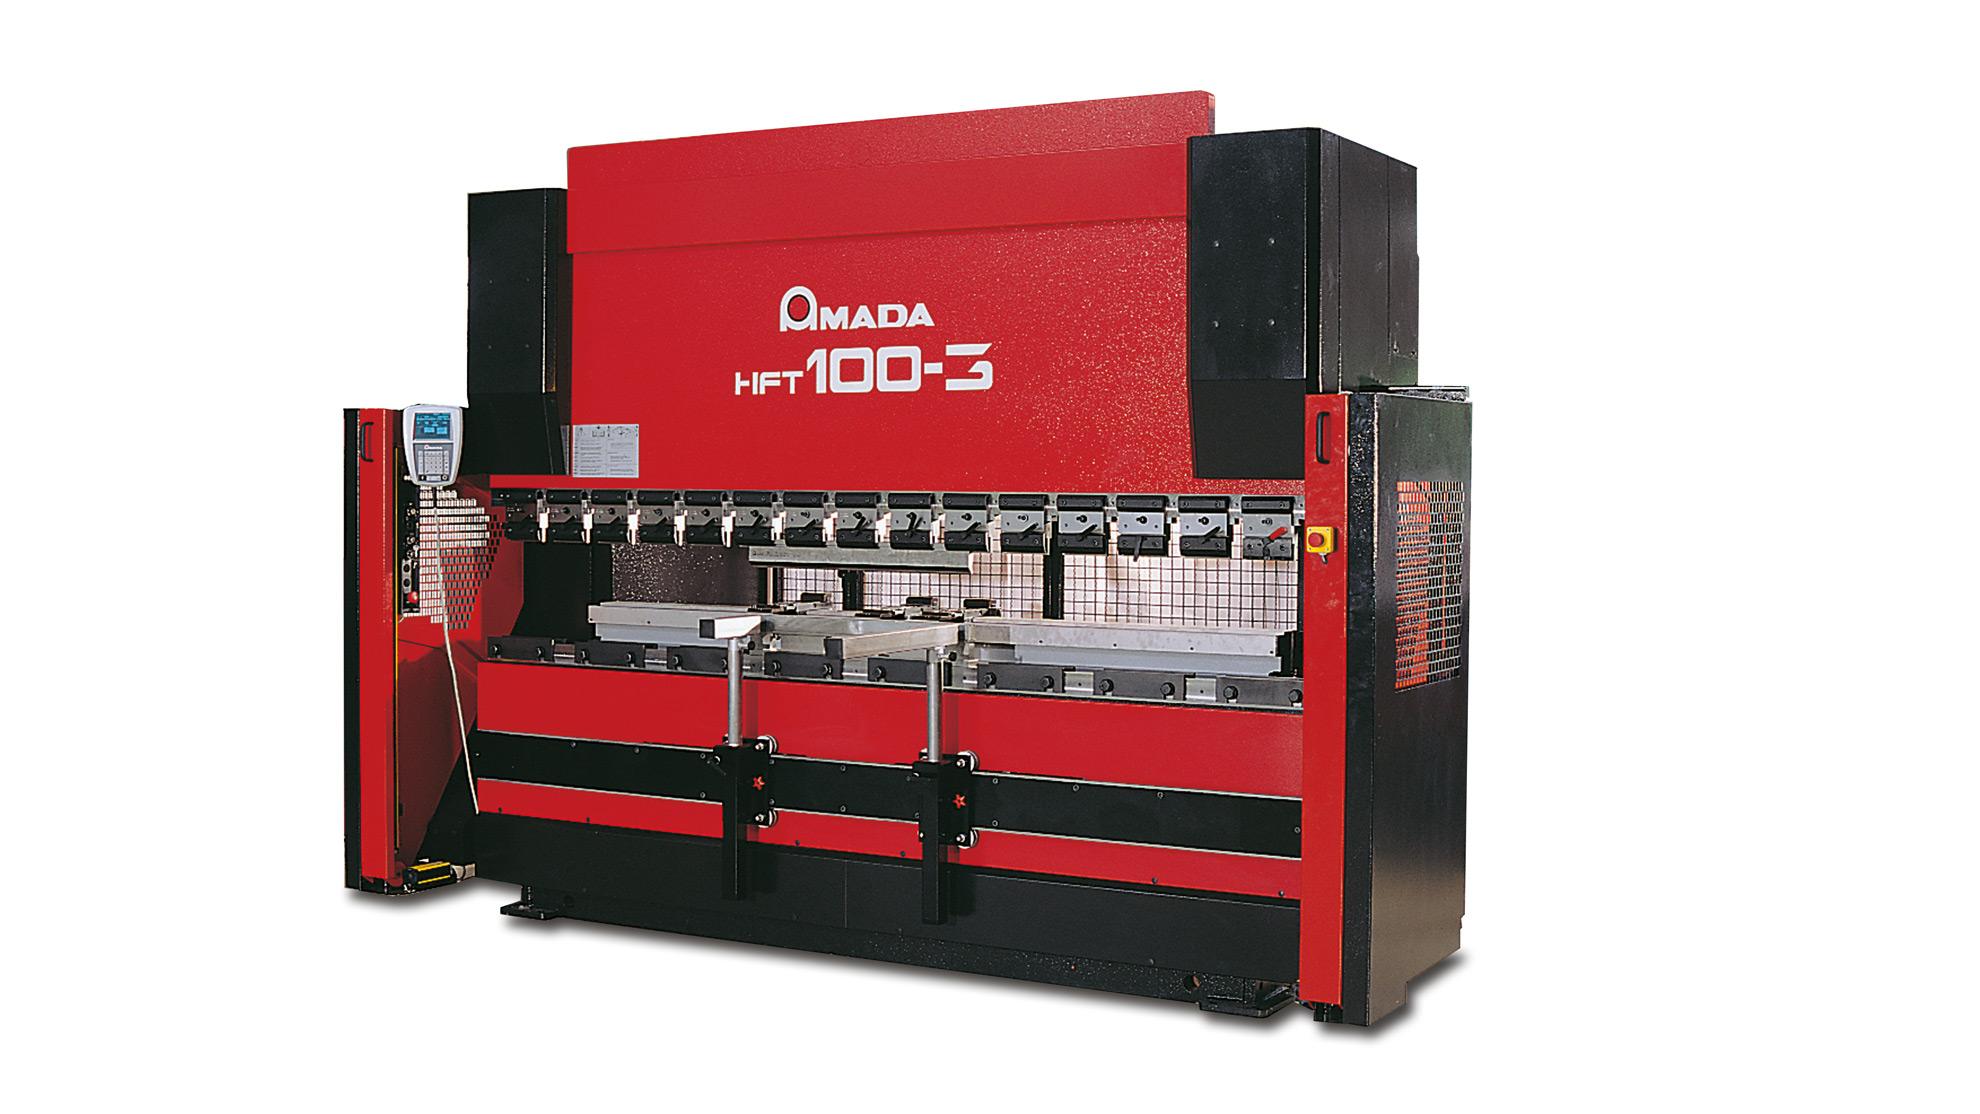 HFT-1003 press-brake